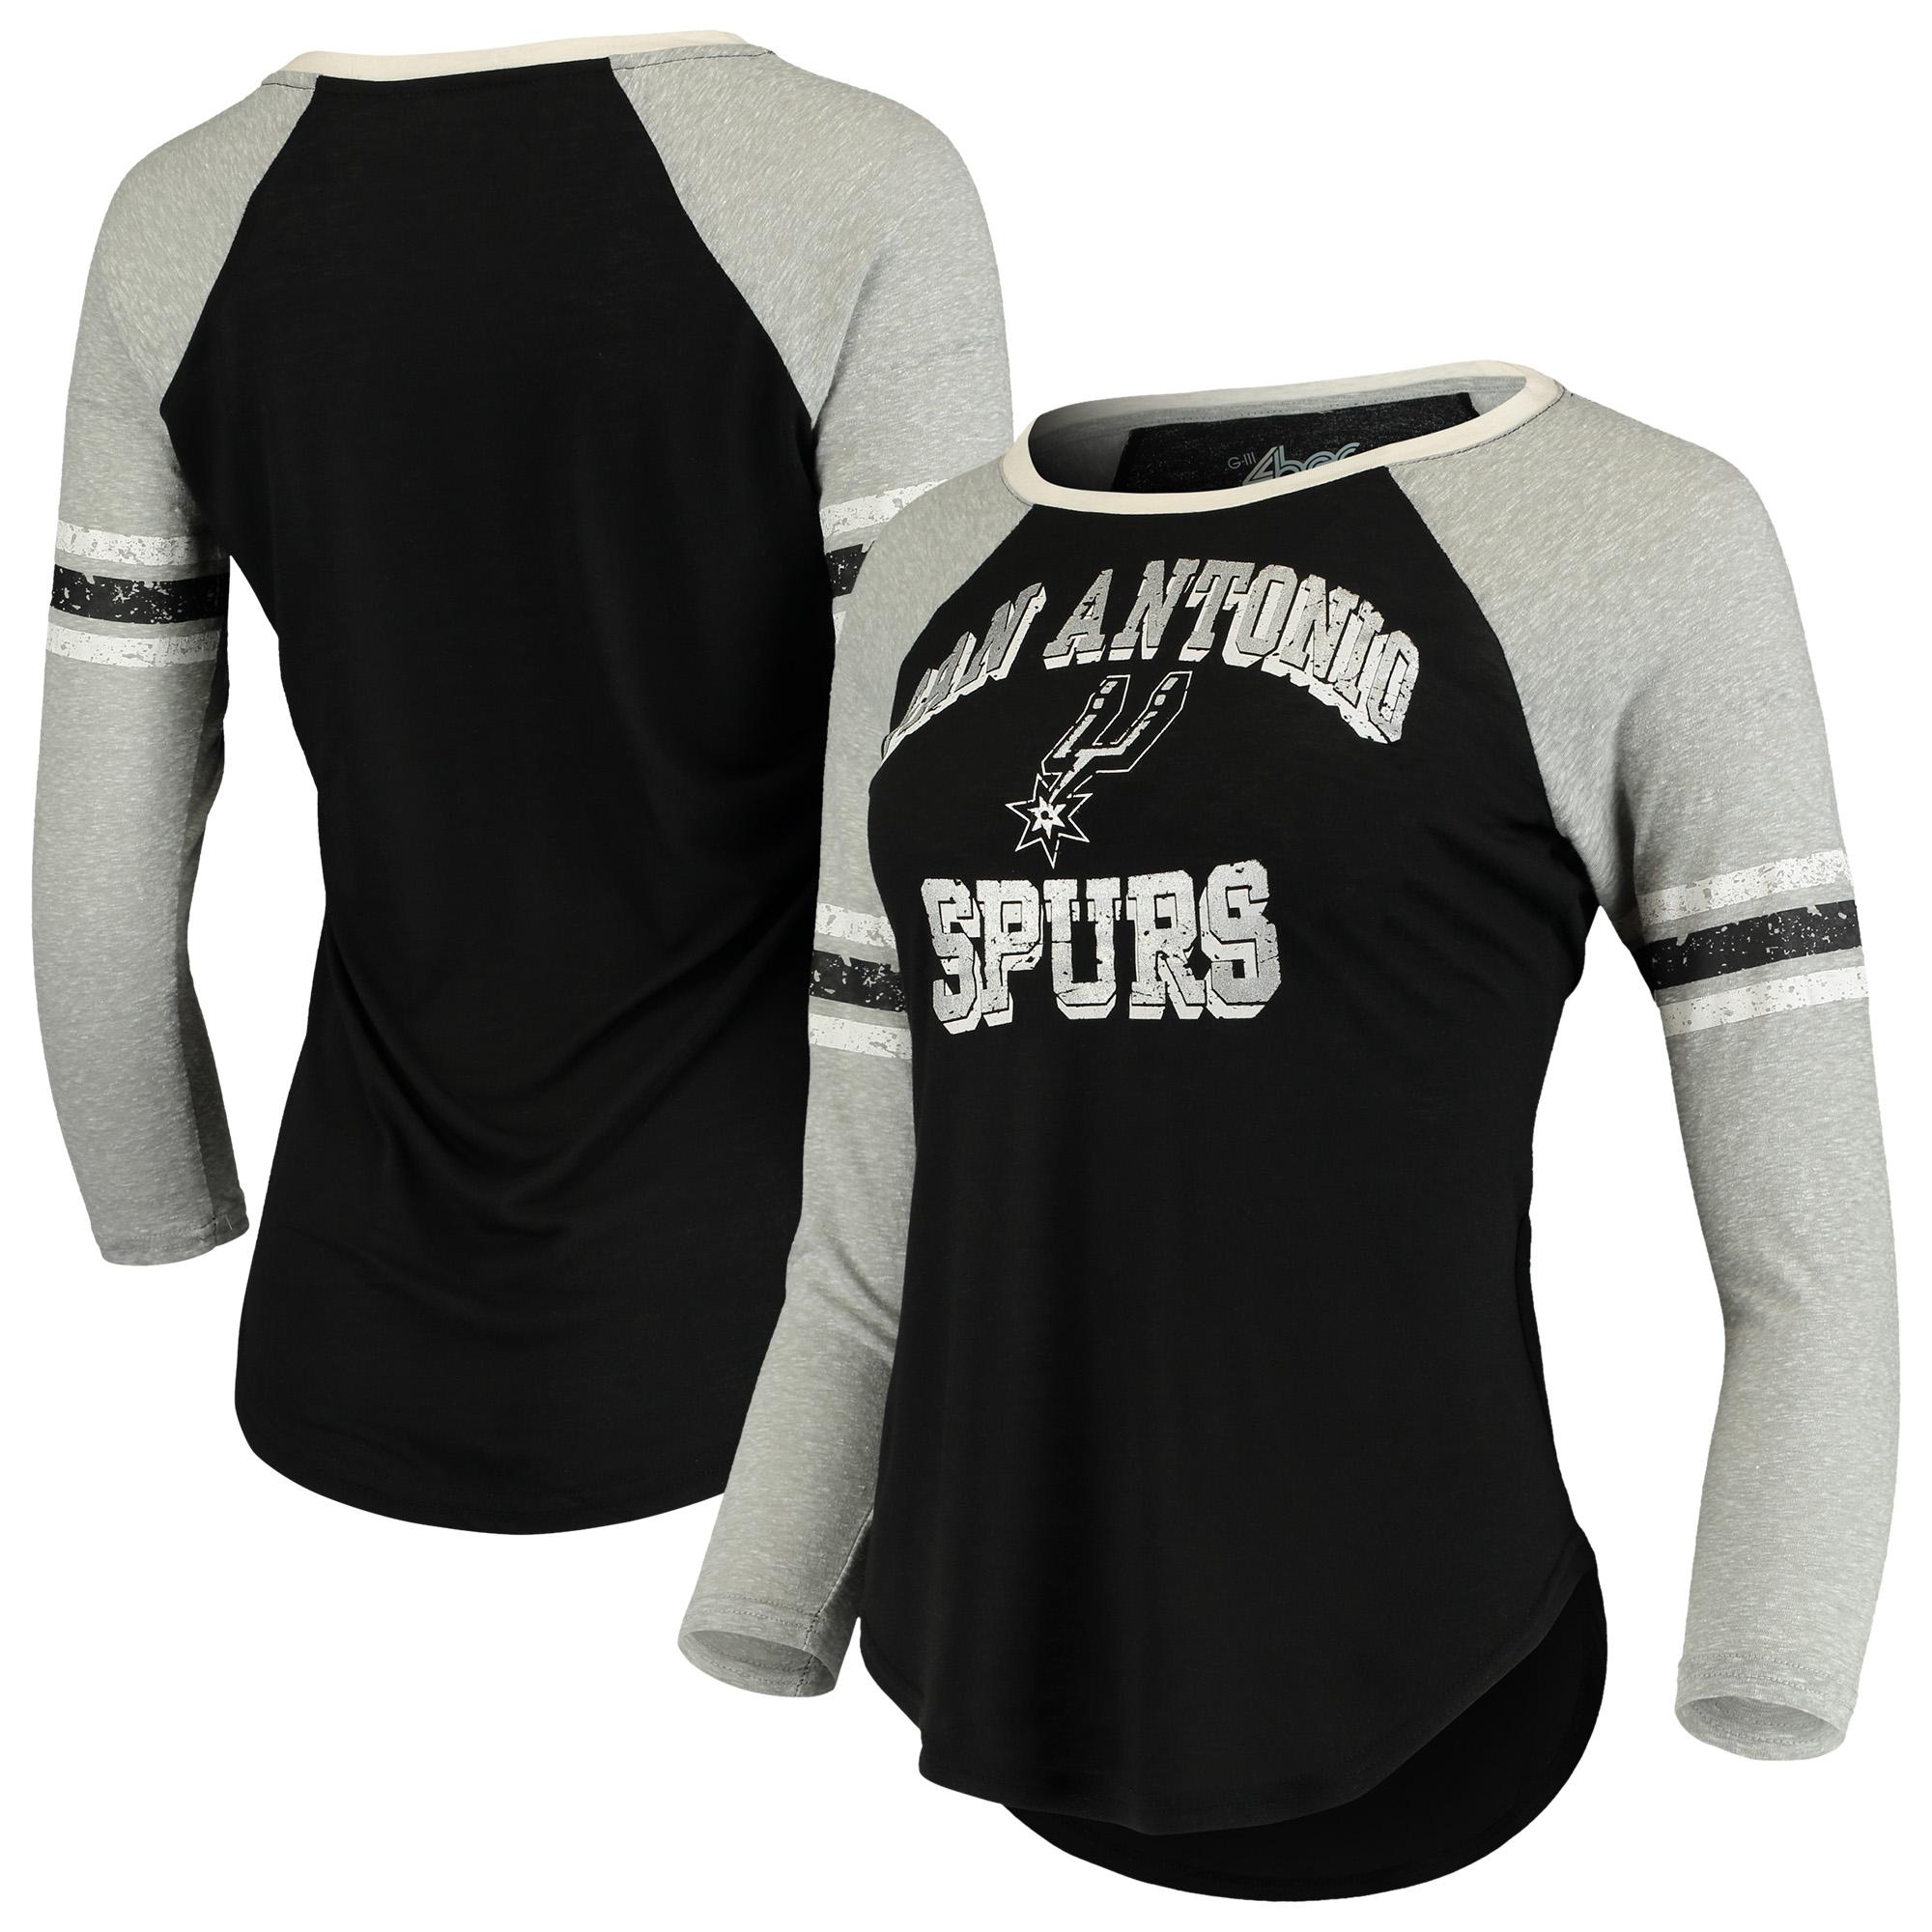 San Antonio Spurs G-III 4Her by Carl Banks Women's The Court Tri-Blend Raglan 3/4-Sleeve T-Shirt - Black/Heathered Gray